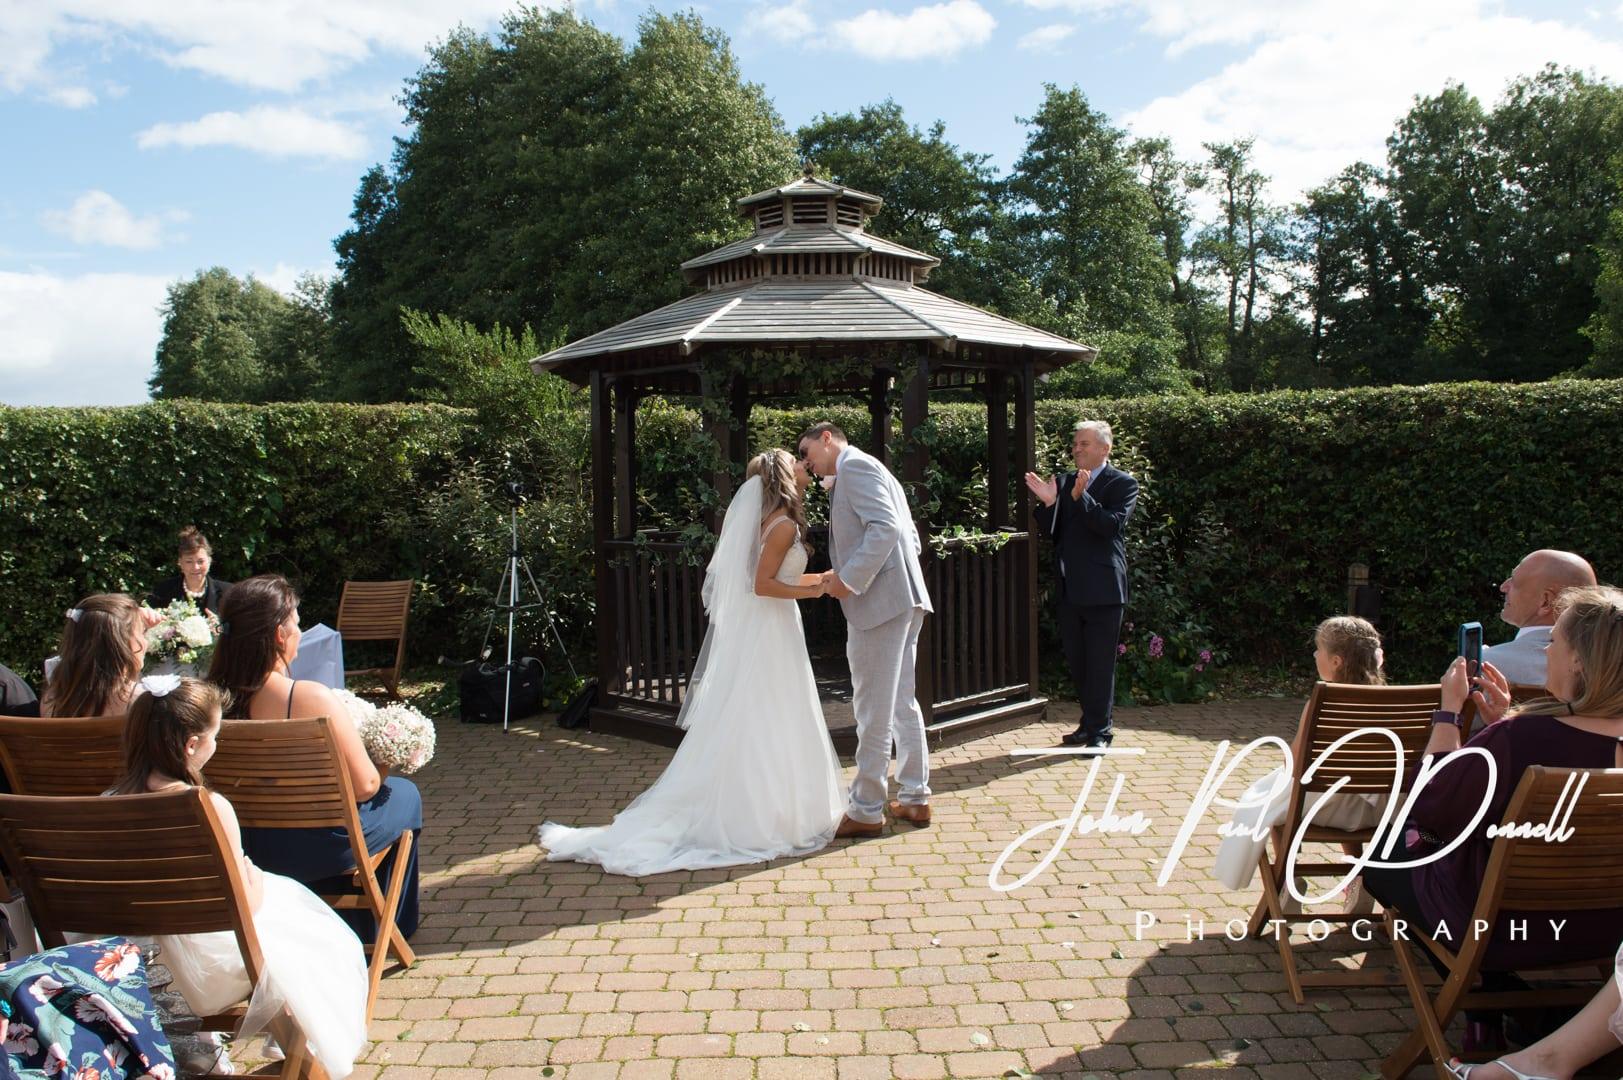 Francesca and Taylors wedding at Tewin Bury Farm